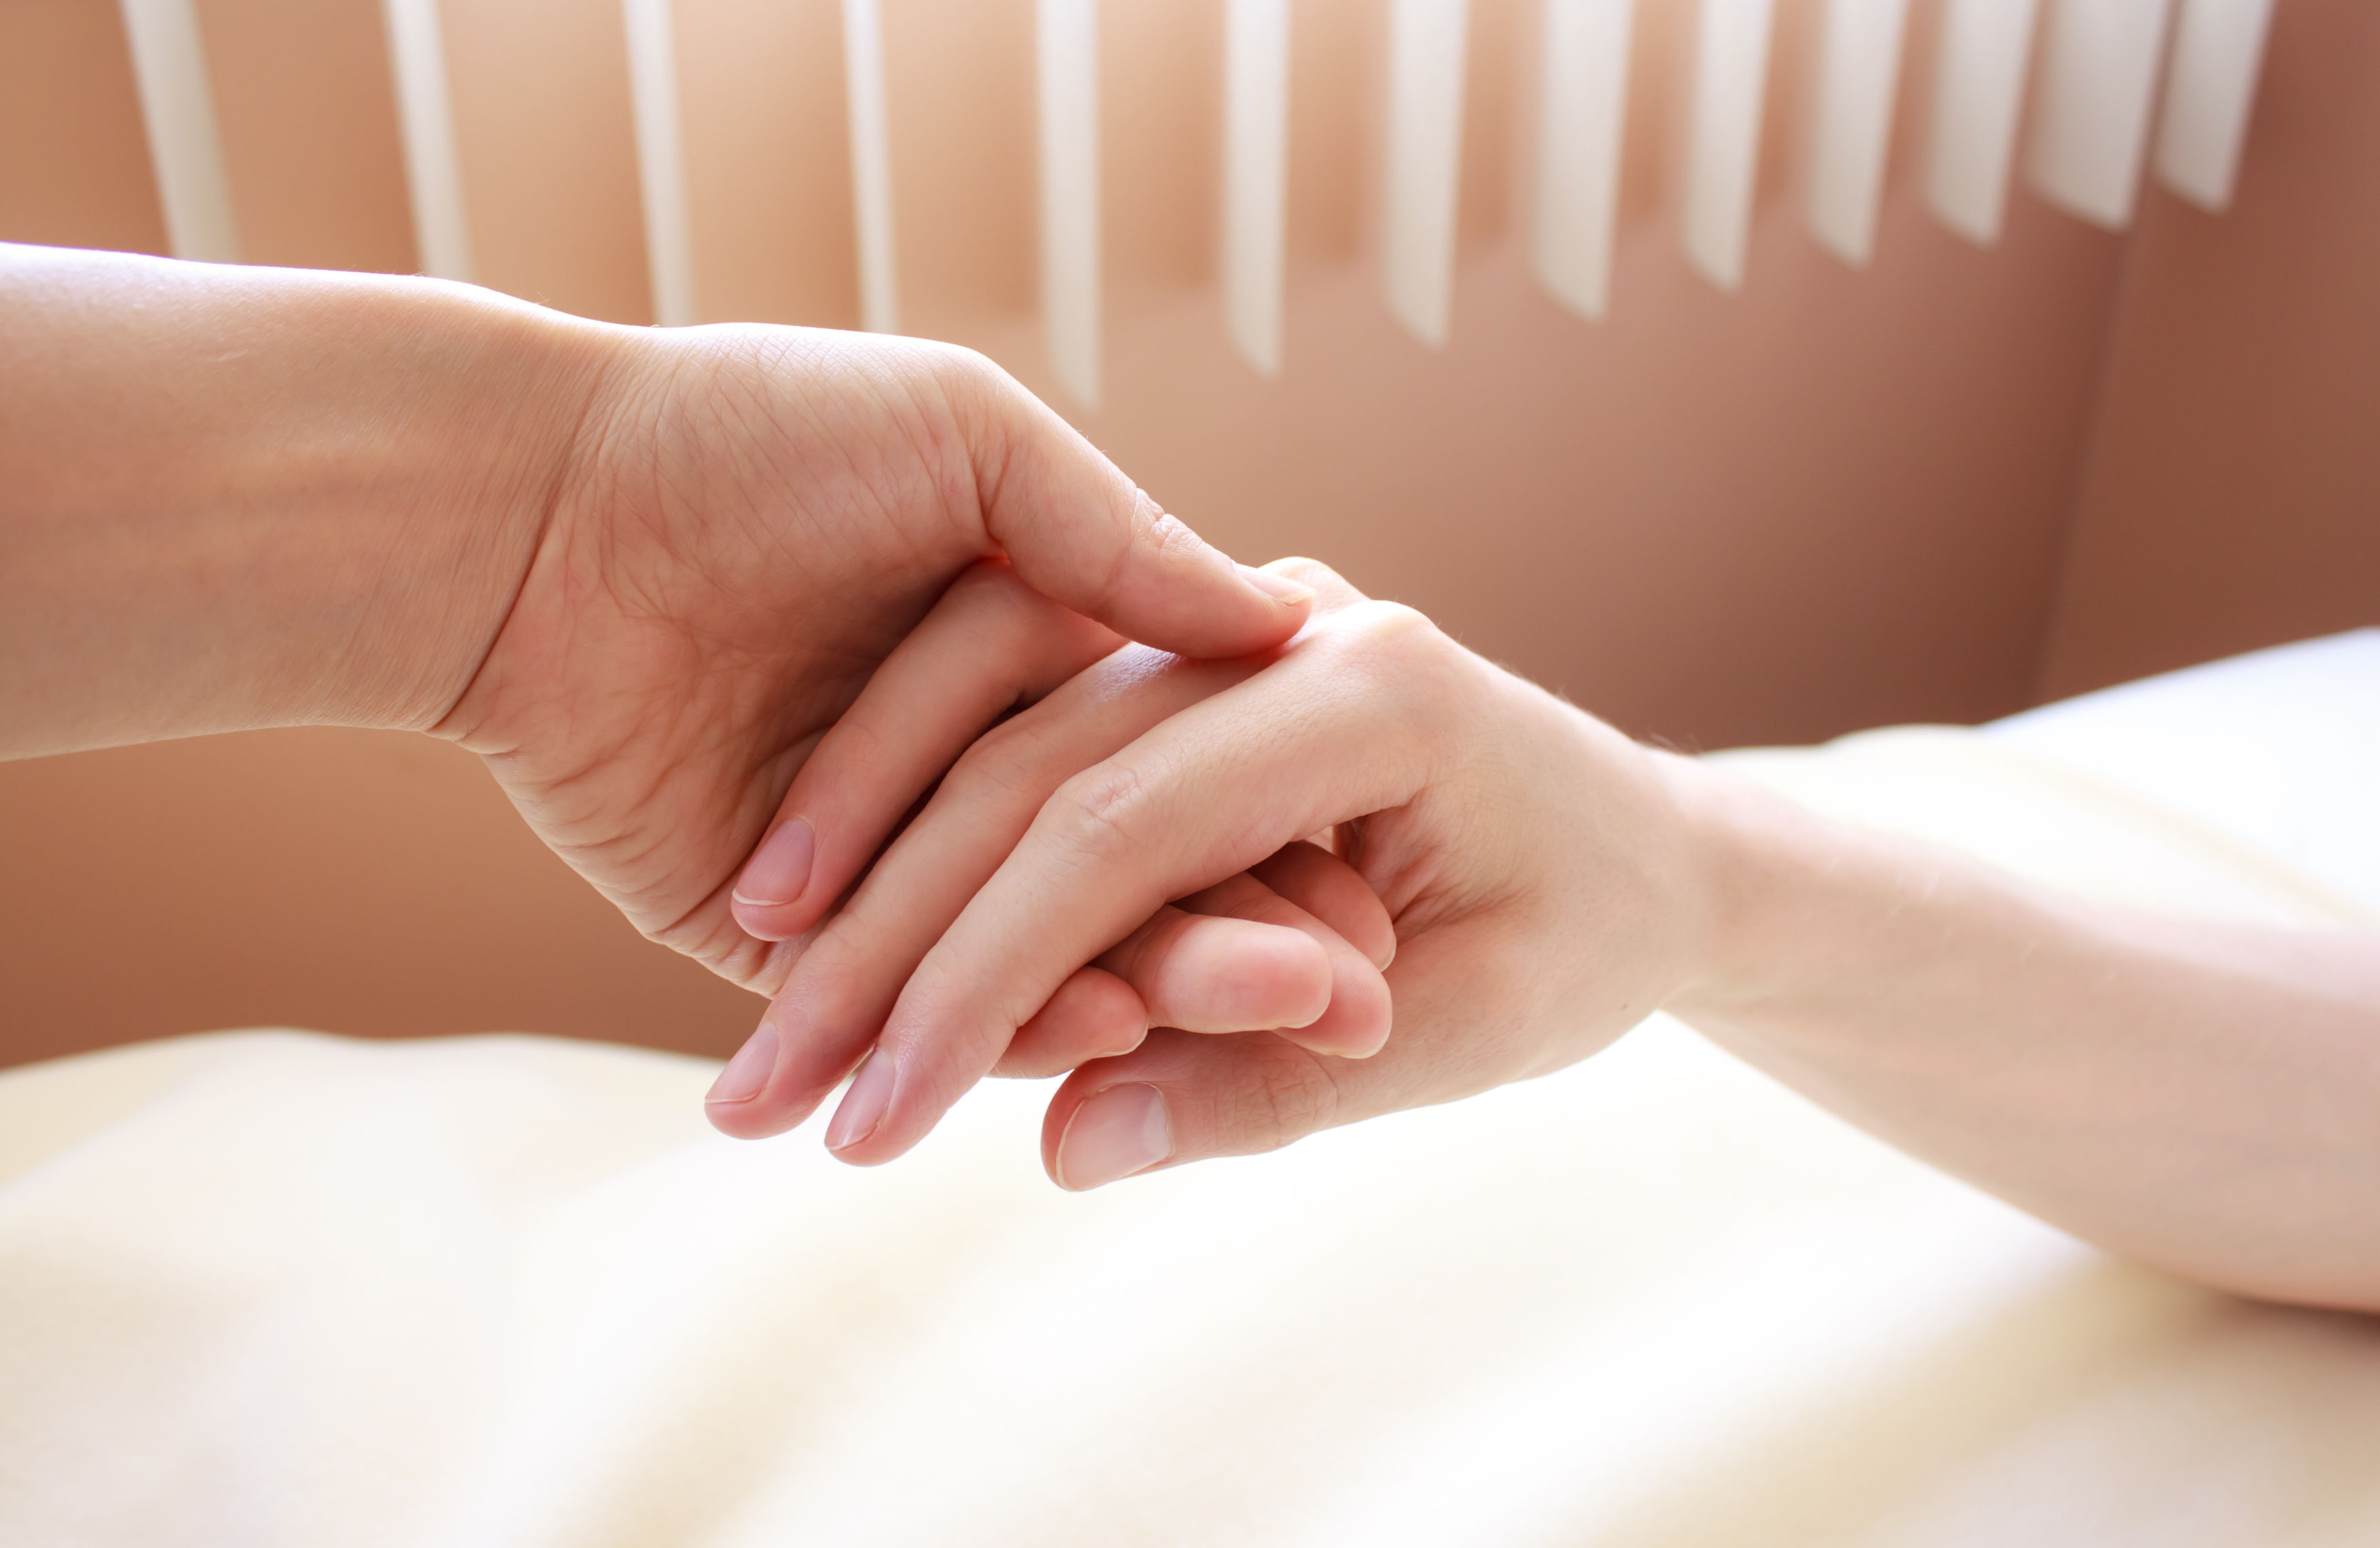 Сонник руки во сне, к чему снятся руки. Толкование 96